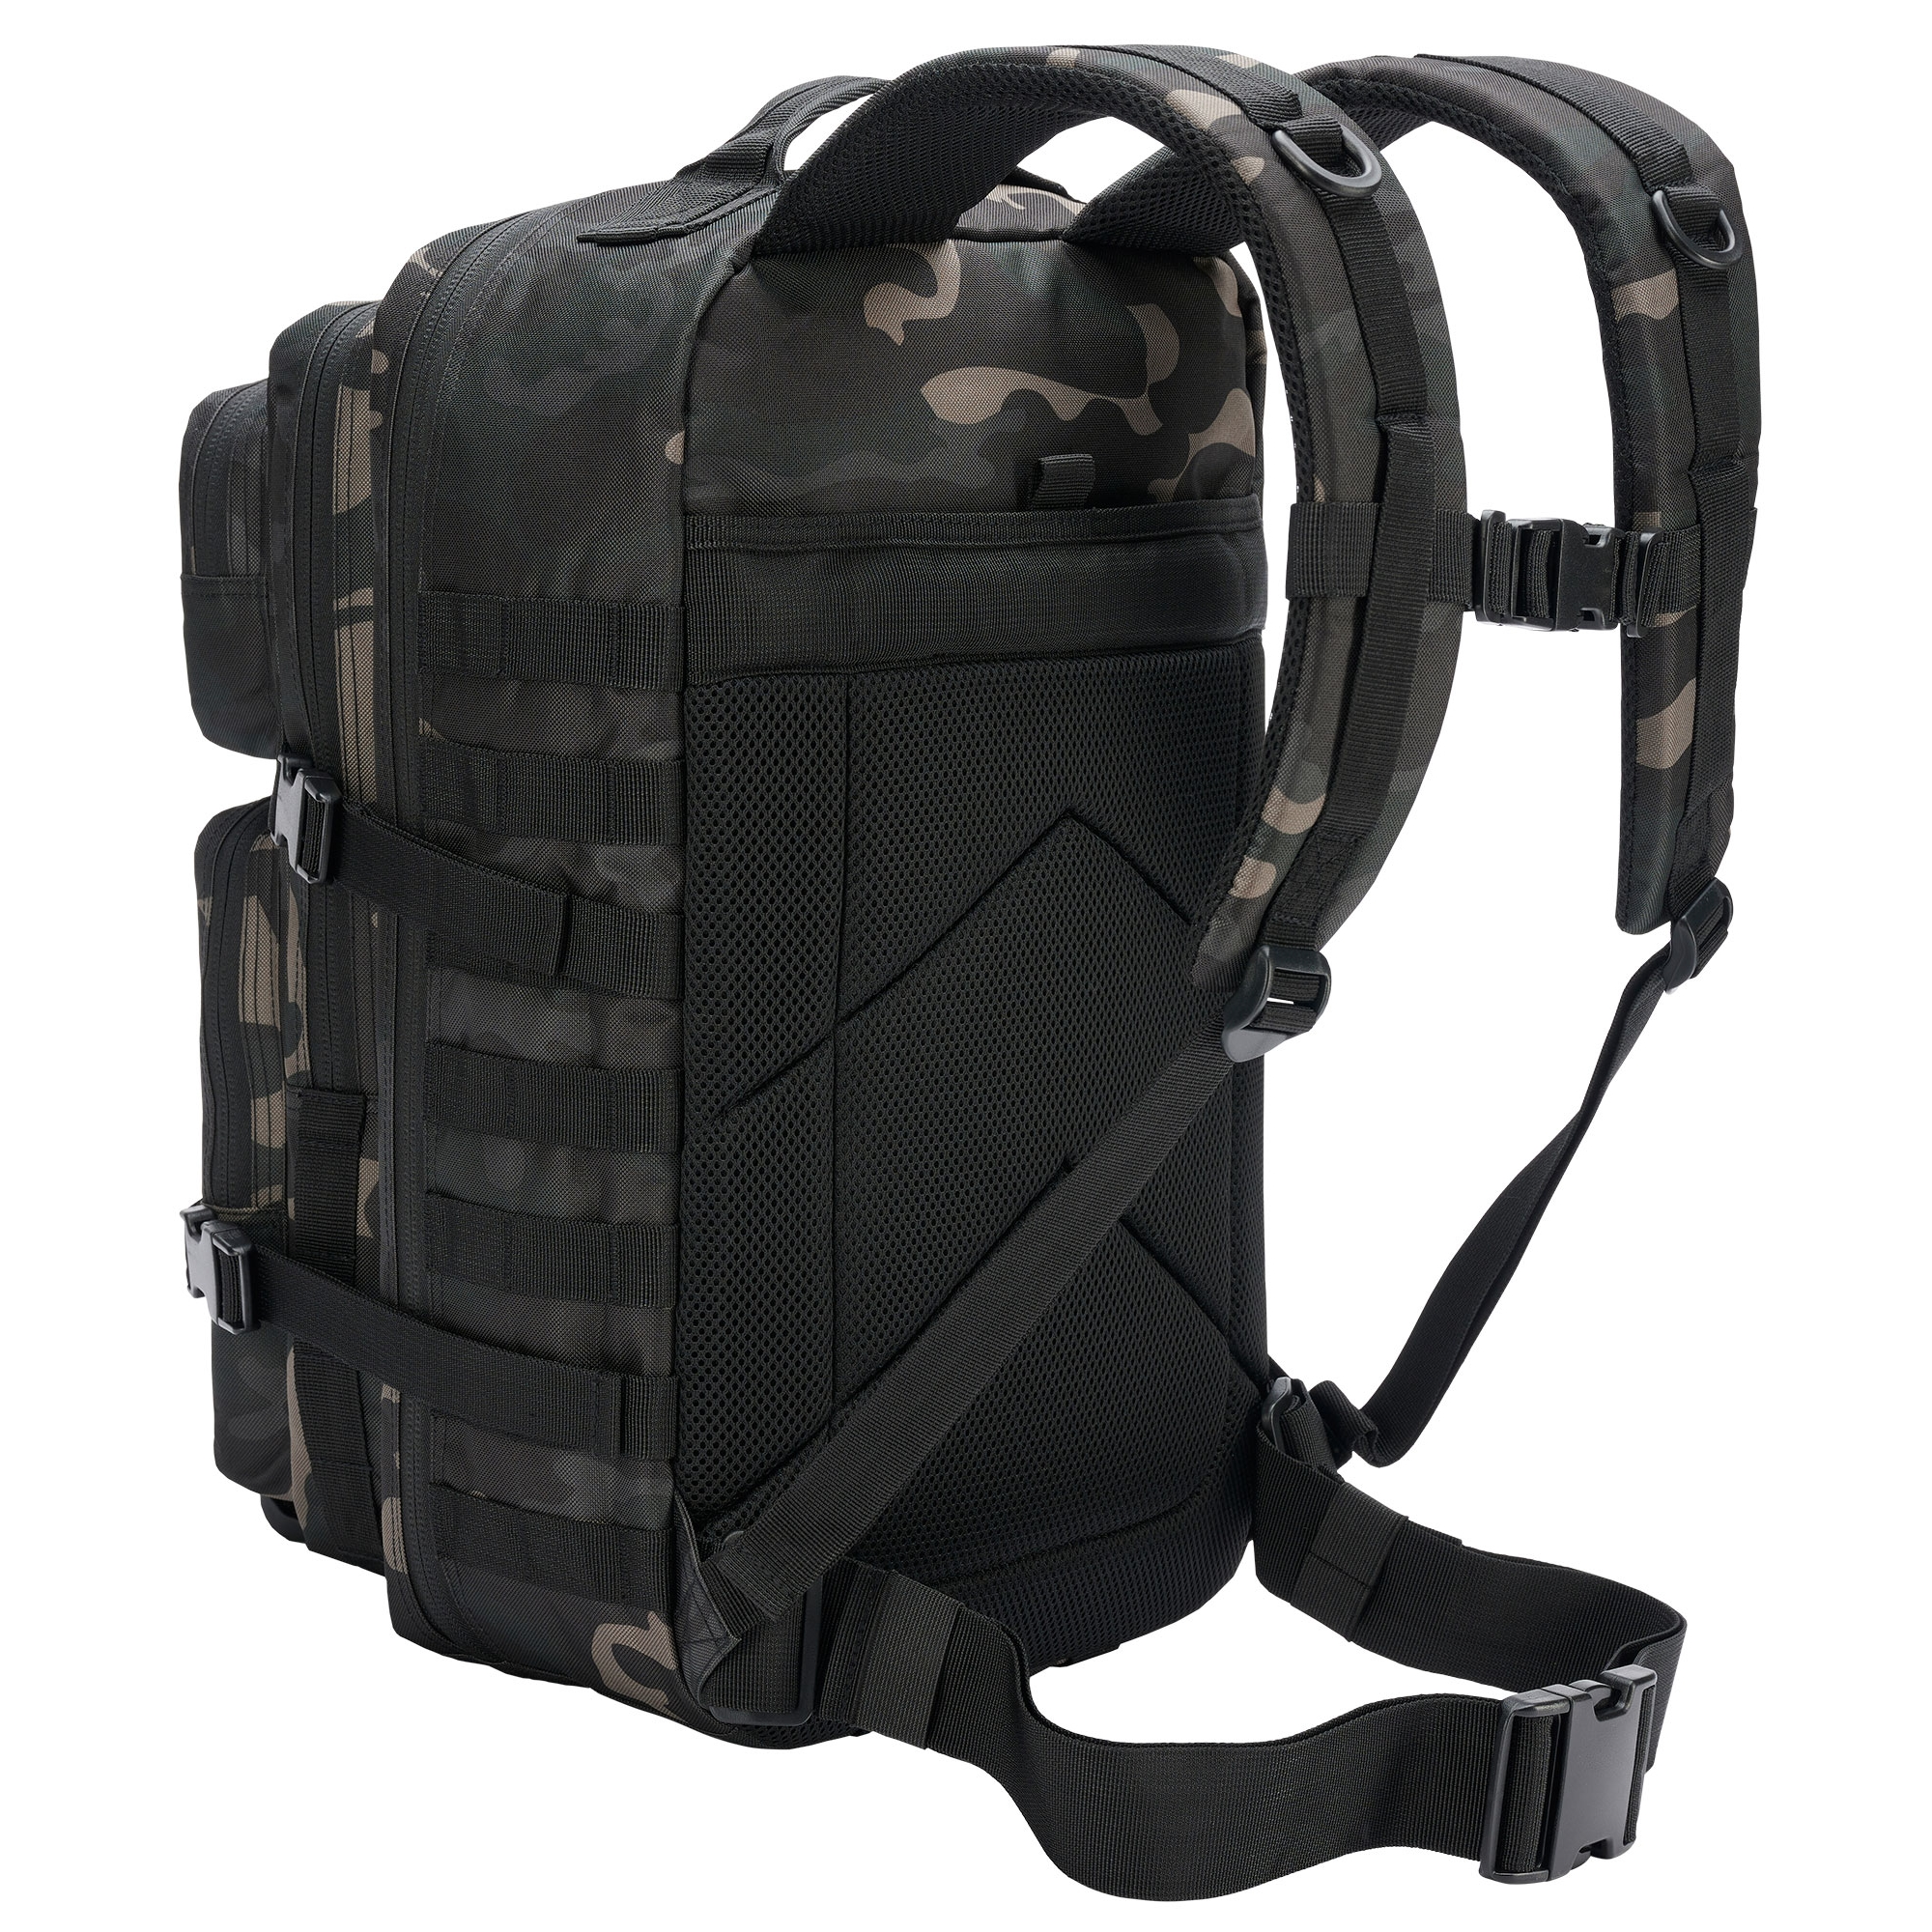 Indexbild 9 - Brandit US Cooper Rucksack Molle Backpack Bundeswehr Armee Wandern Reise Tactica